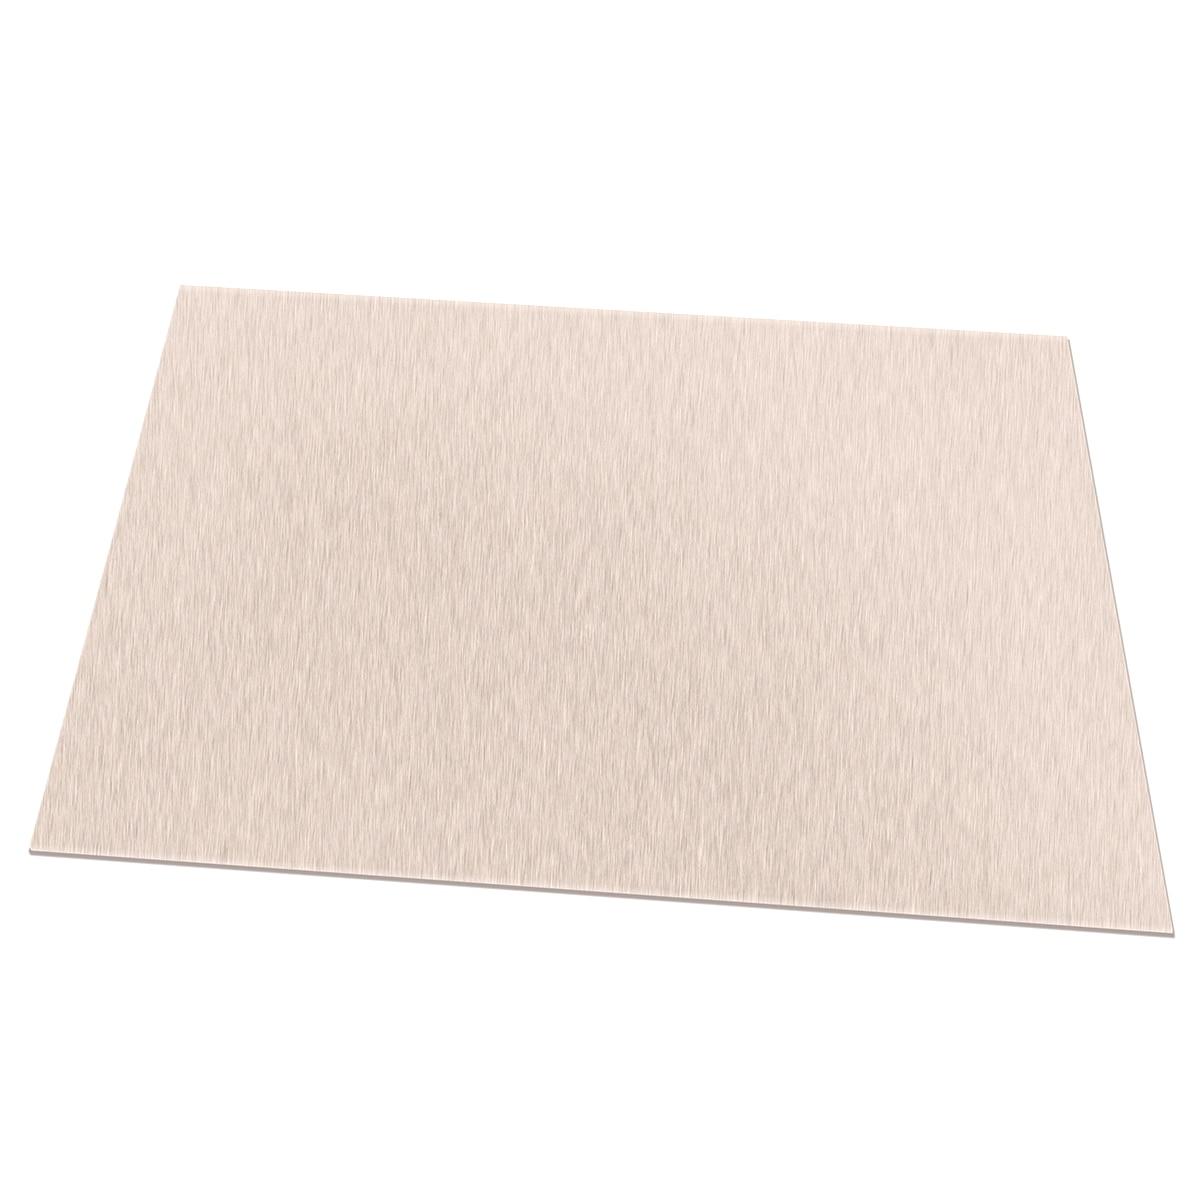 "set of 4 20ga Stainless Steel 2B Mill Finish 316 Sheet Plate 6/"" x 12/"""